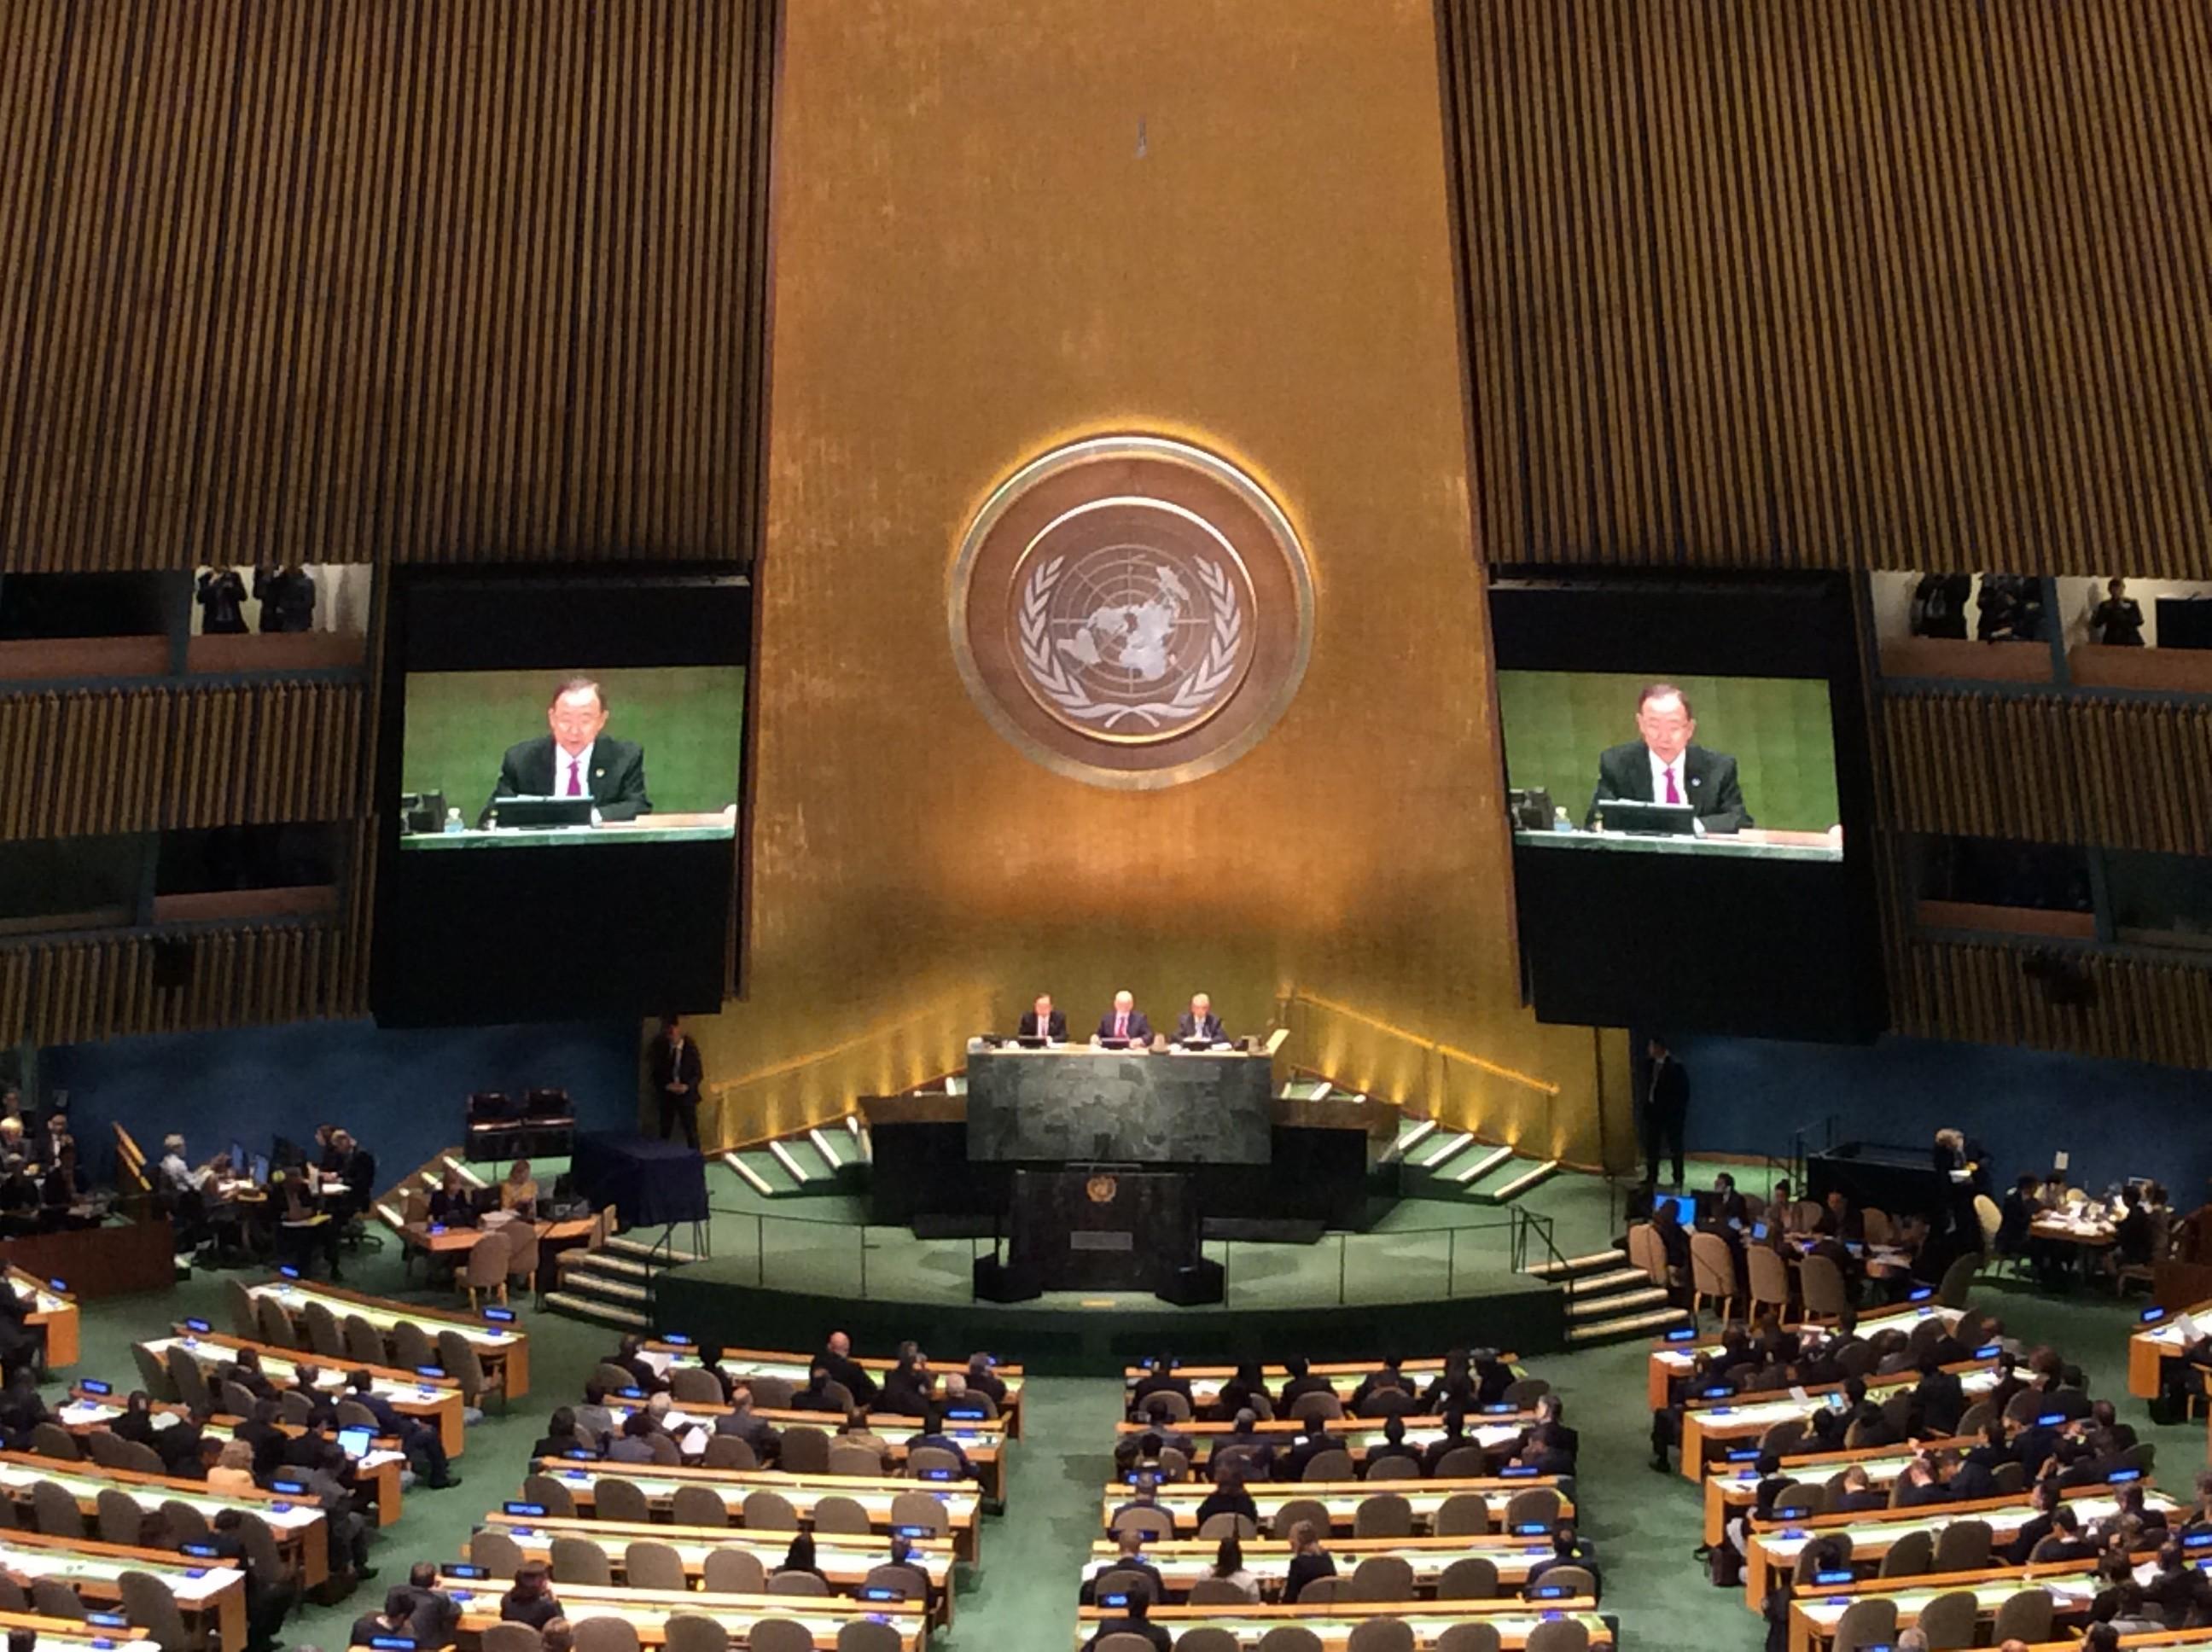 Ban ki Moon at the UN General Assembly in New York